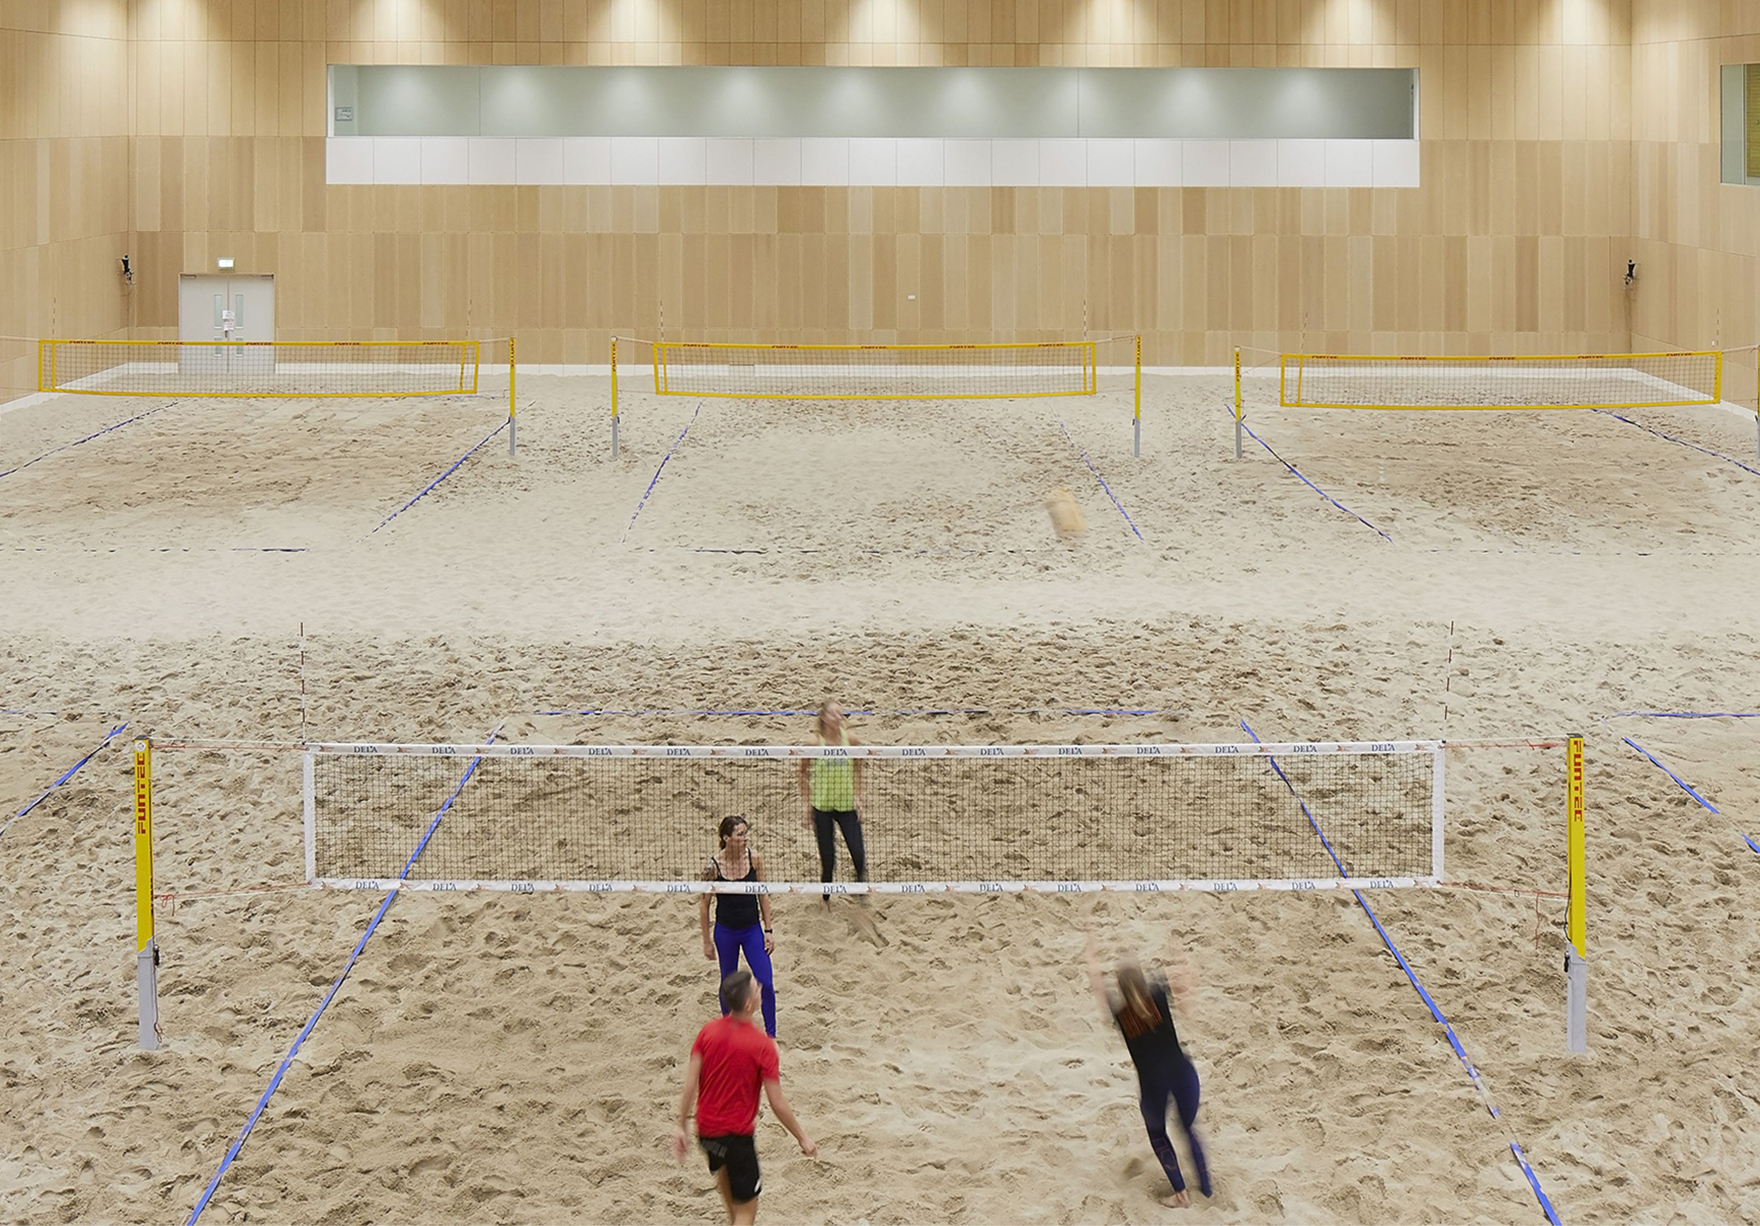 Sportcampus Zuiderpark The Hague Den Haag Netherlands Sport Education Beach Volleyball Hall Lh